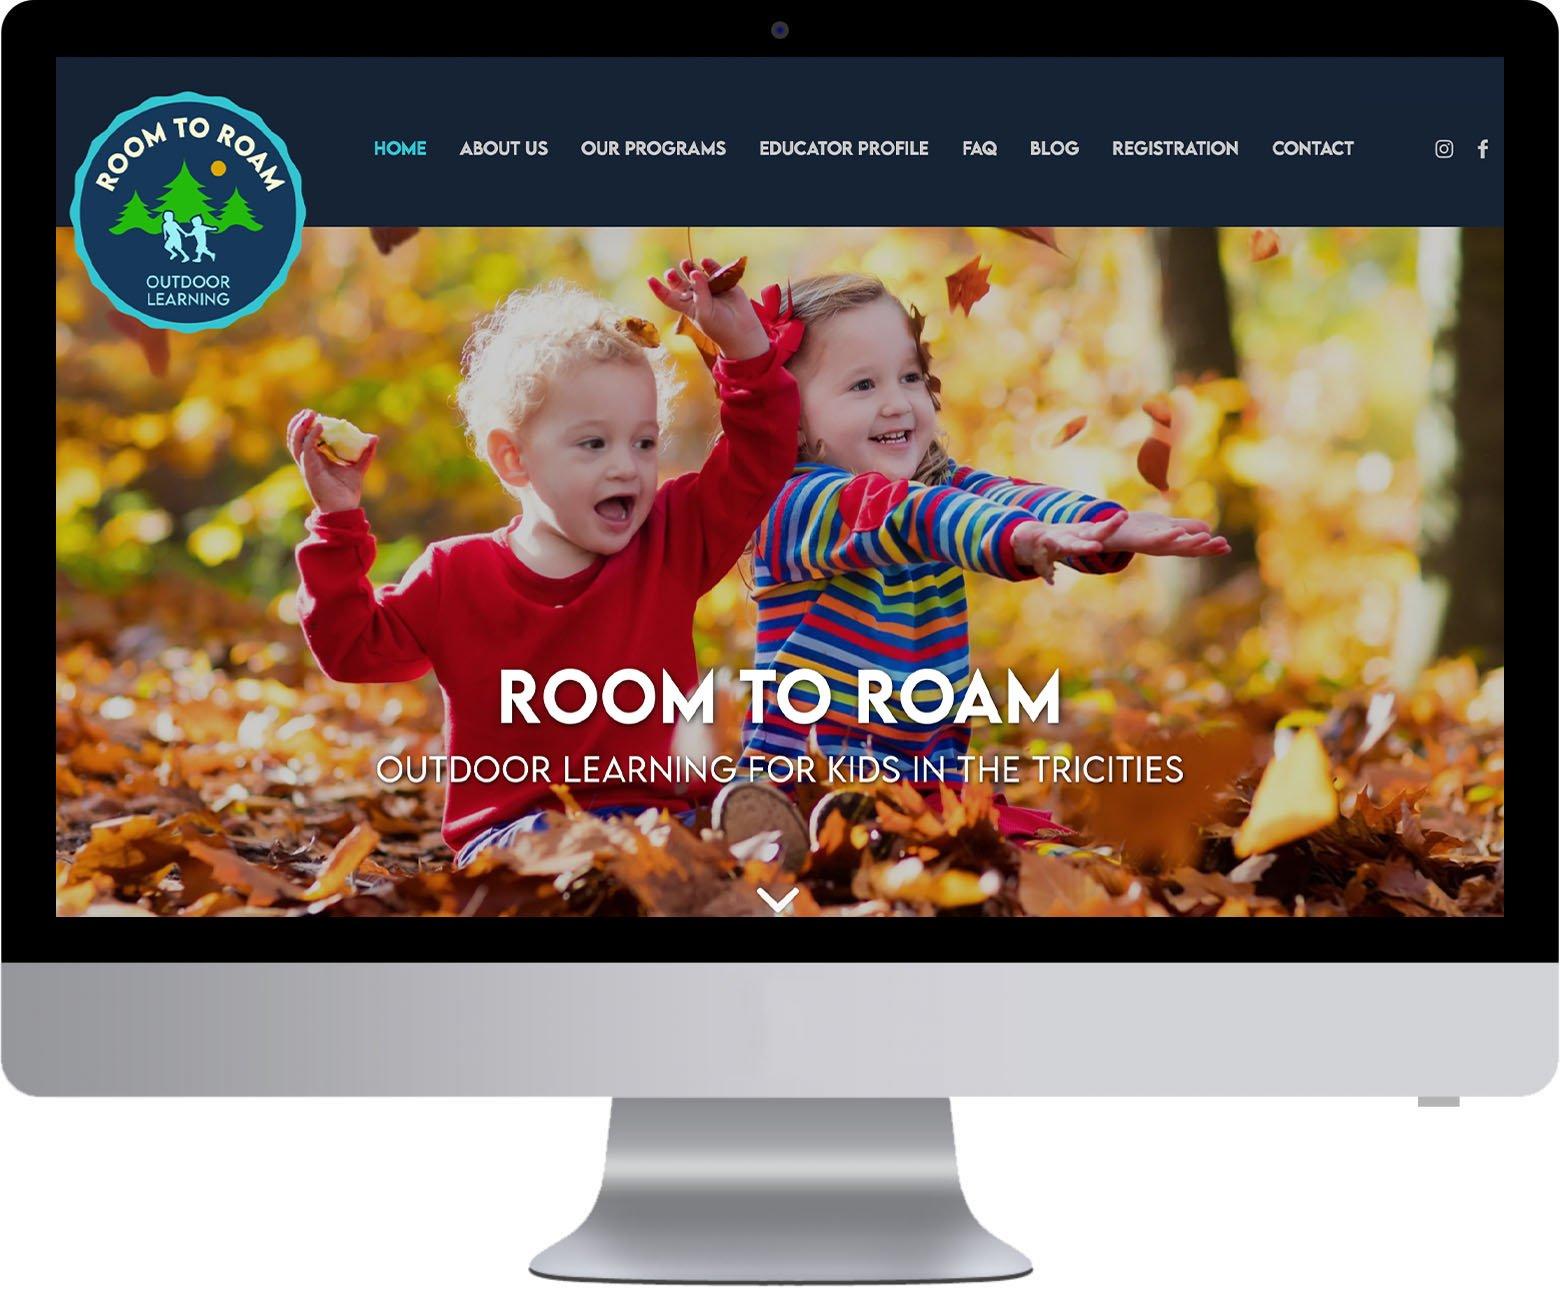 Tricities Web Development - Room to Roam